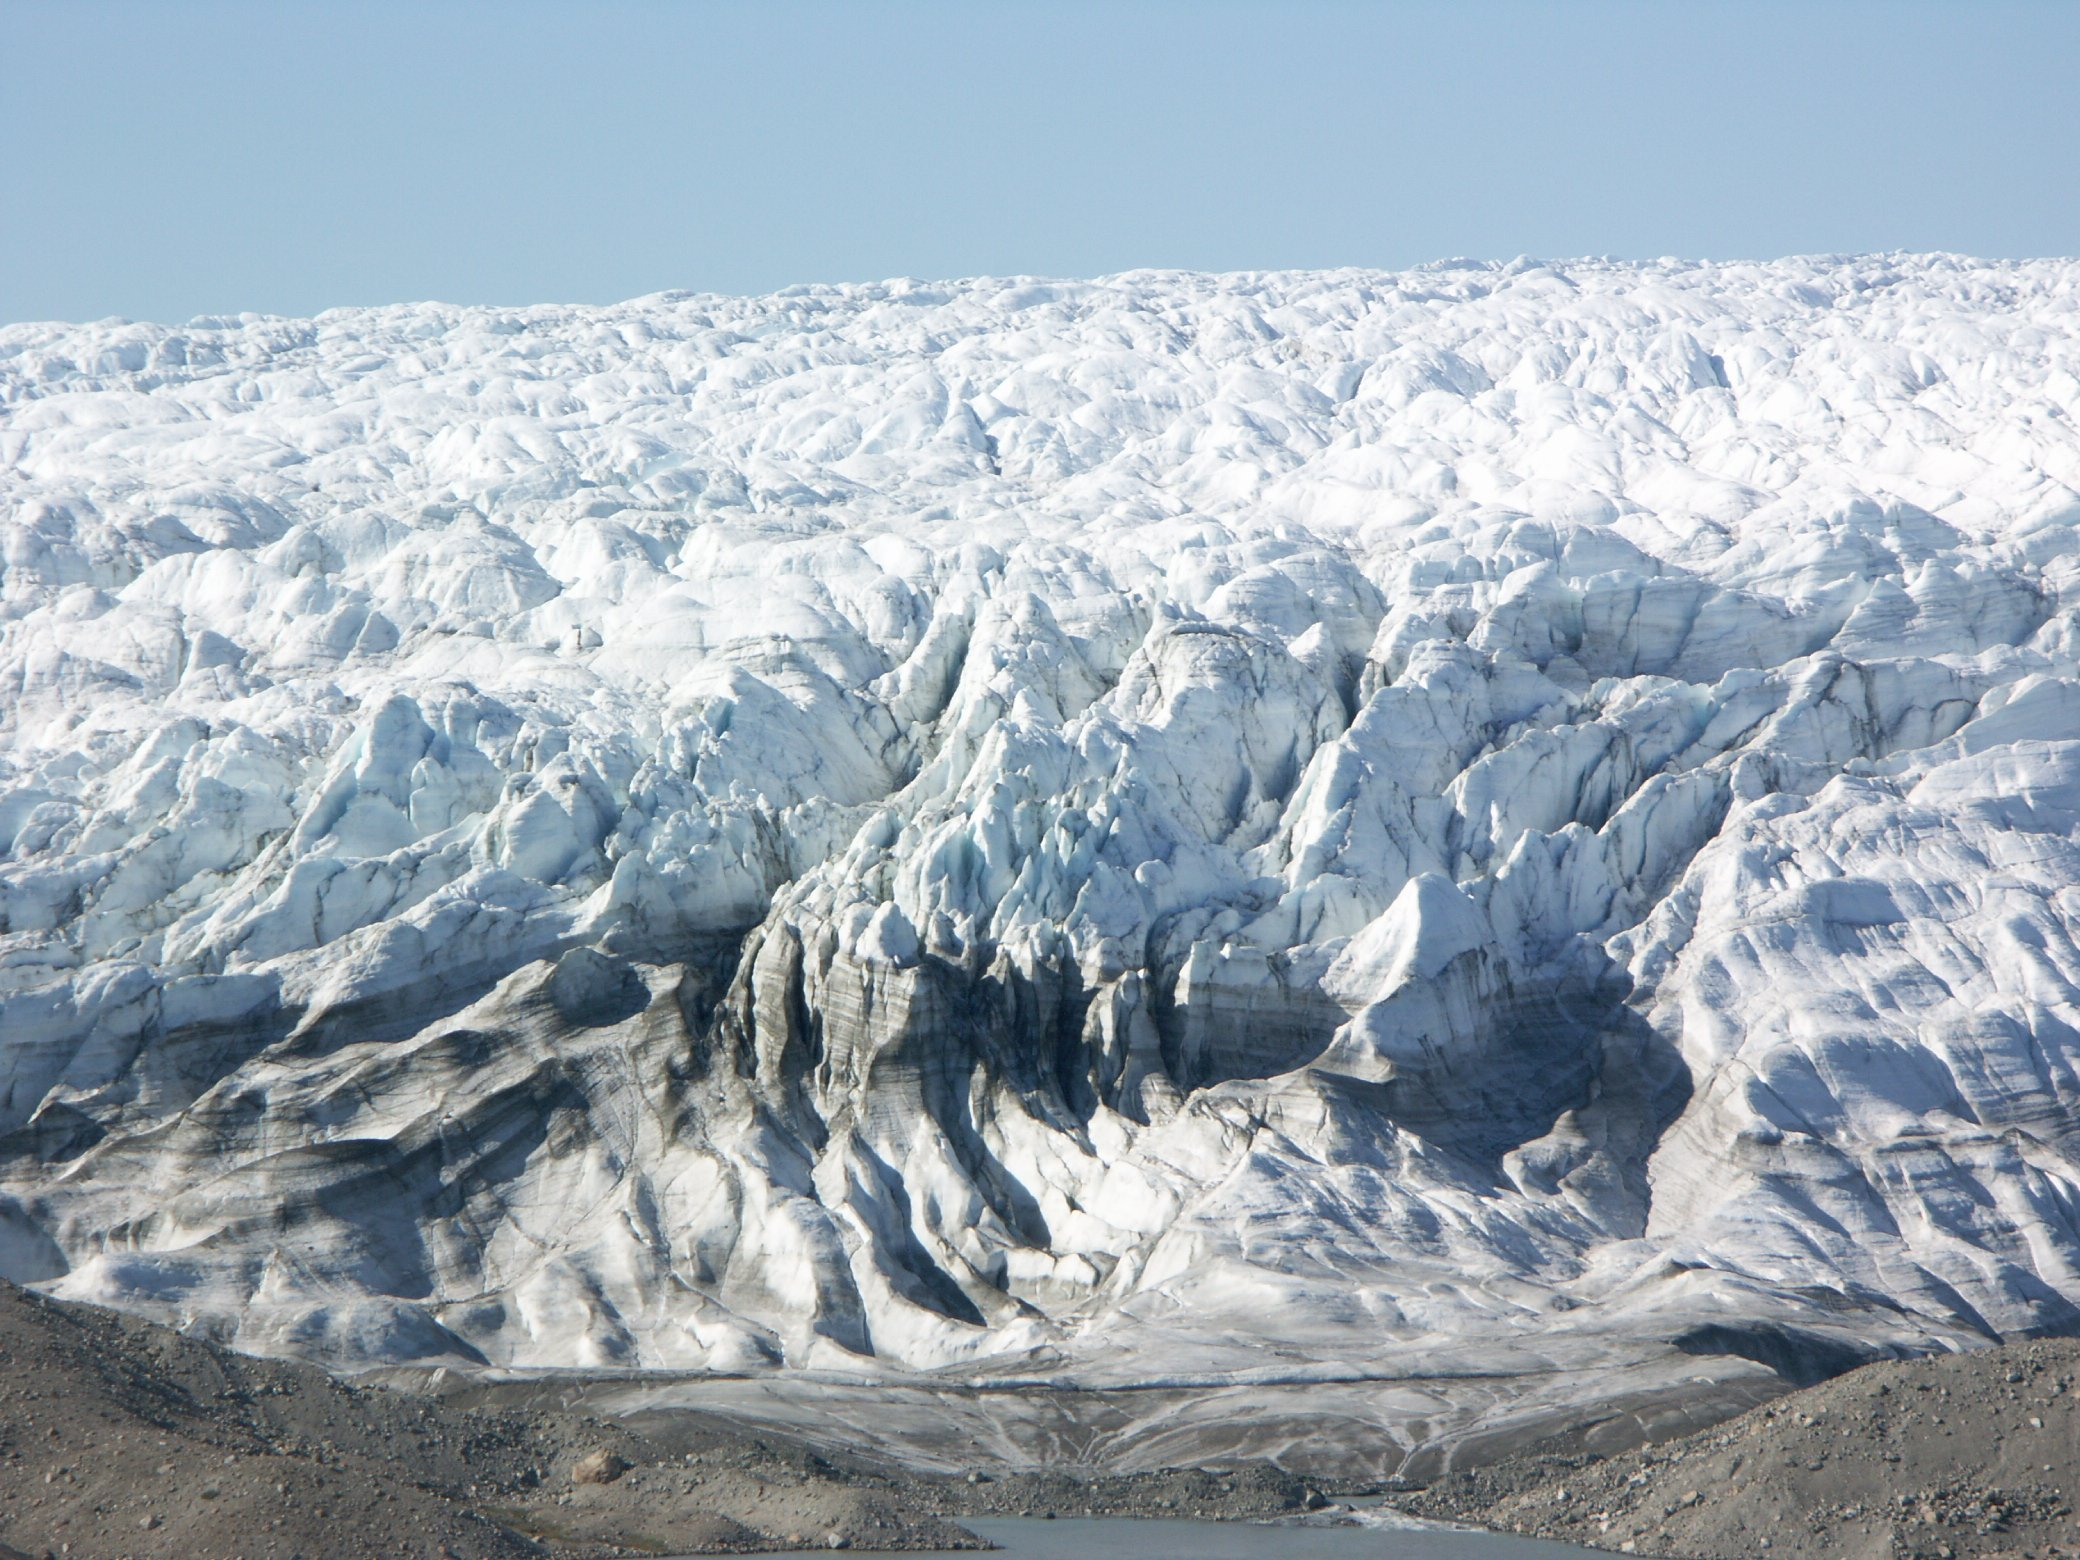 isunnguata sermia greenland.jpg?resize=412,232 - Le Pôle Nord bat son record de chaleur avec 21° C